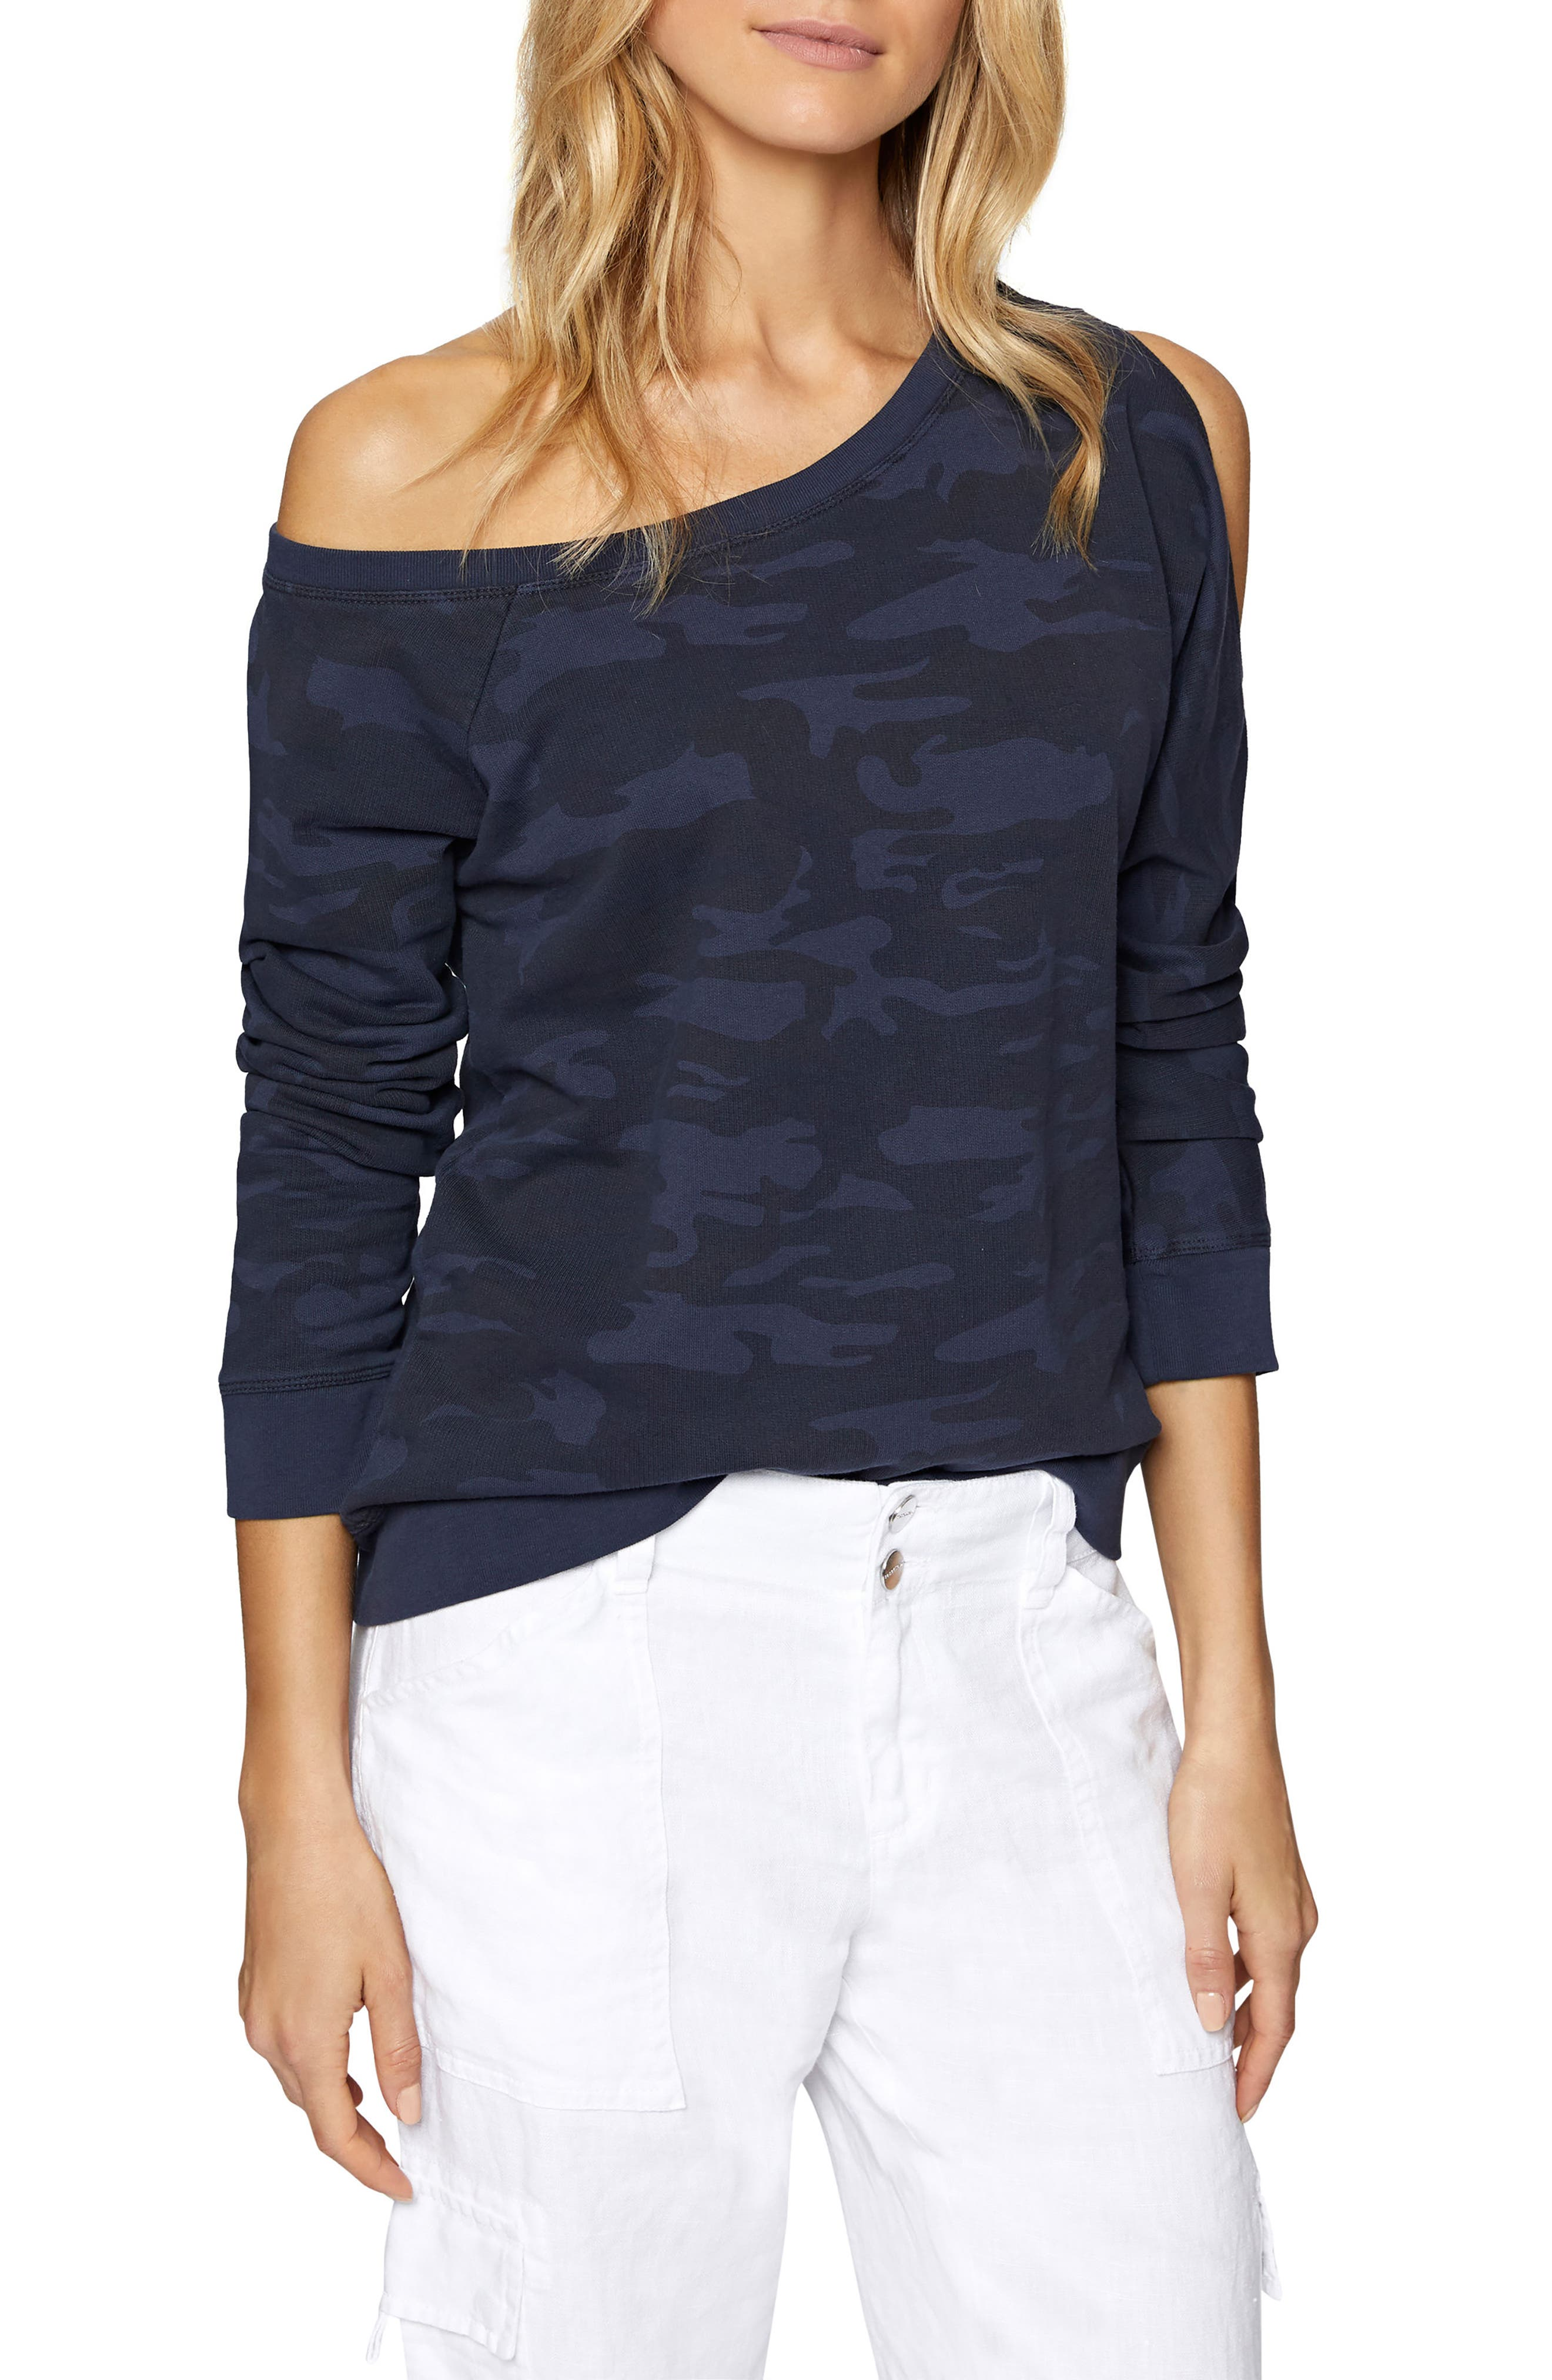 Alexi Asymmetrical Sweatshirt,                             Main thumbnail 1, color,                             Heritage Navy Camo